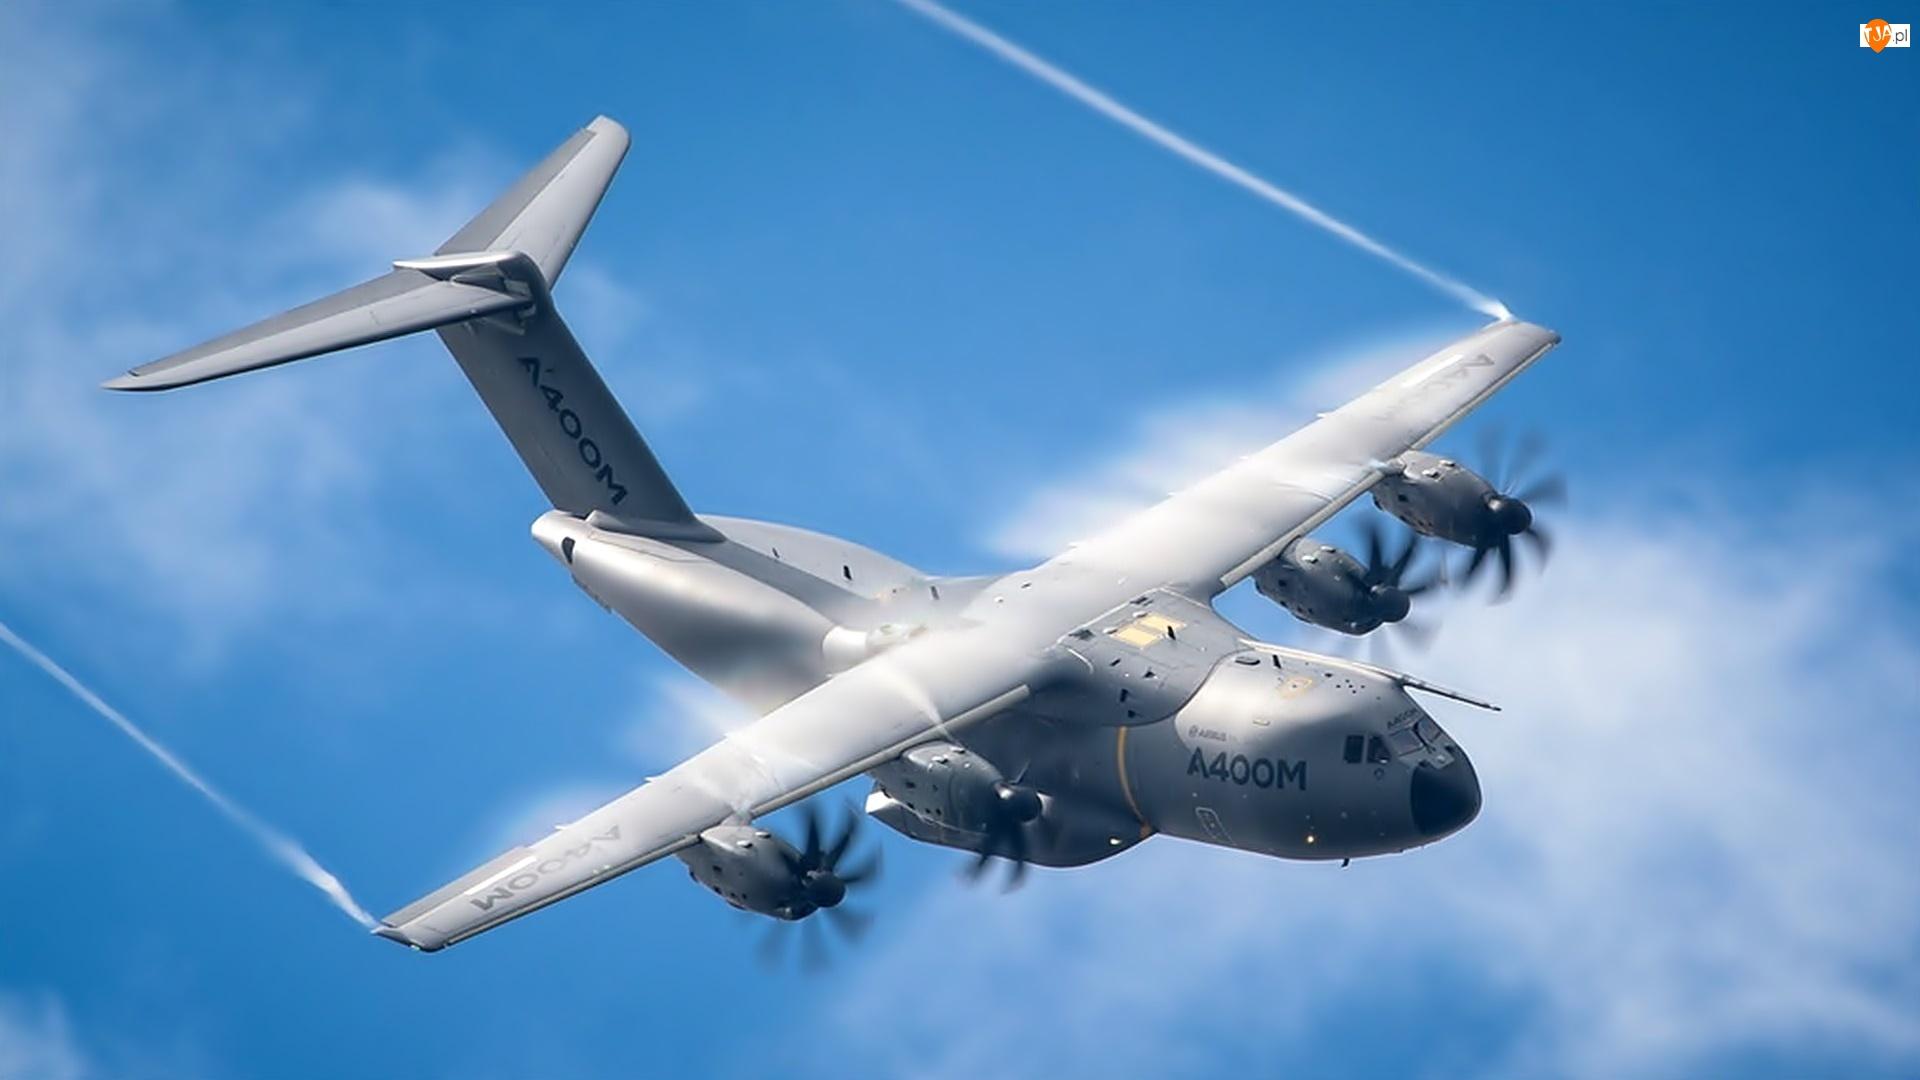 Samolot, A400M, Wojskowy, Airbus